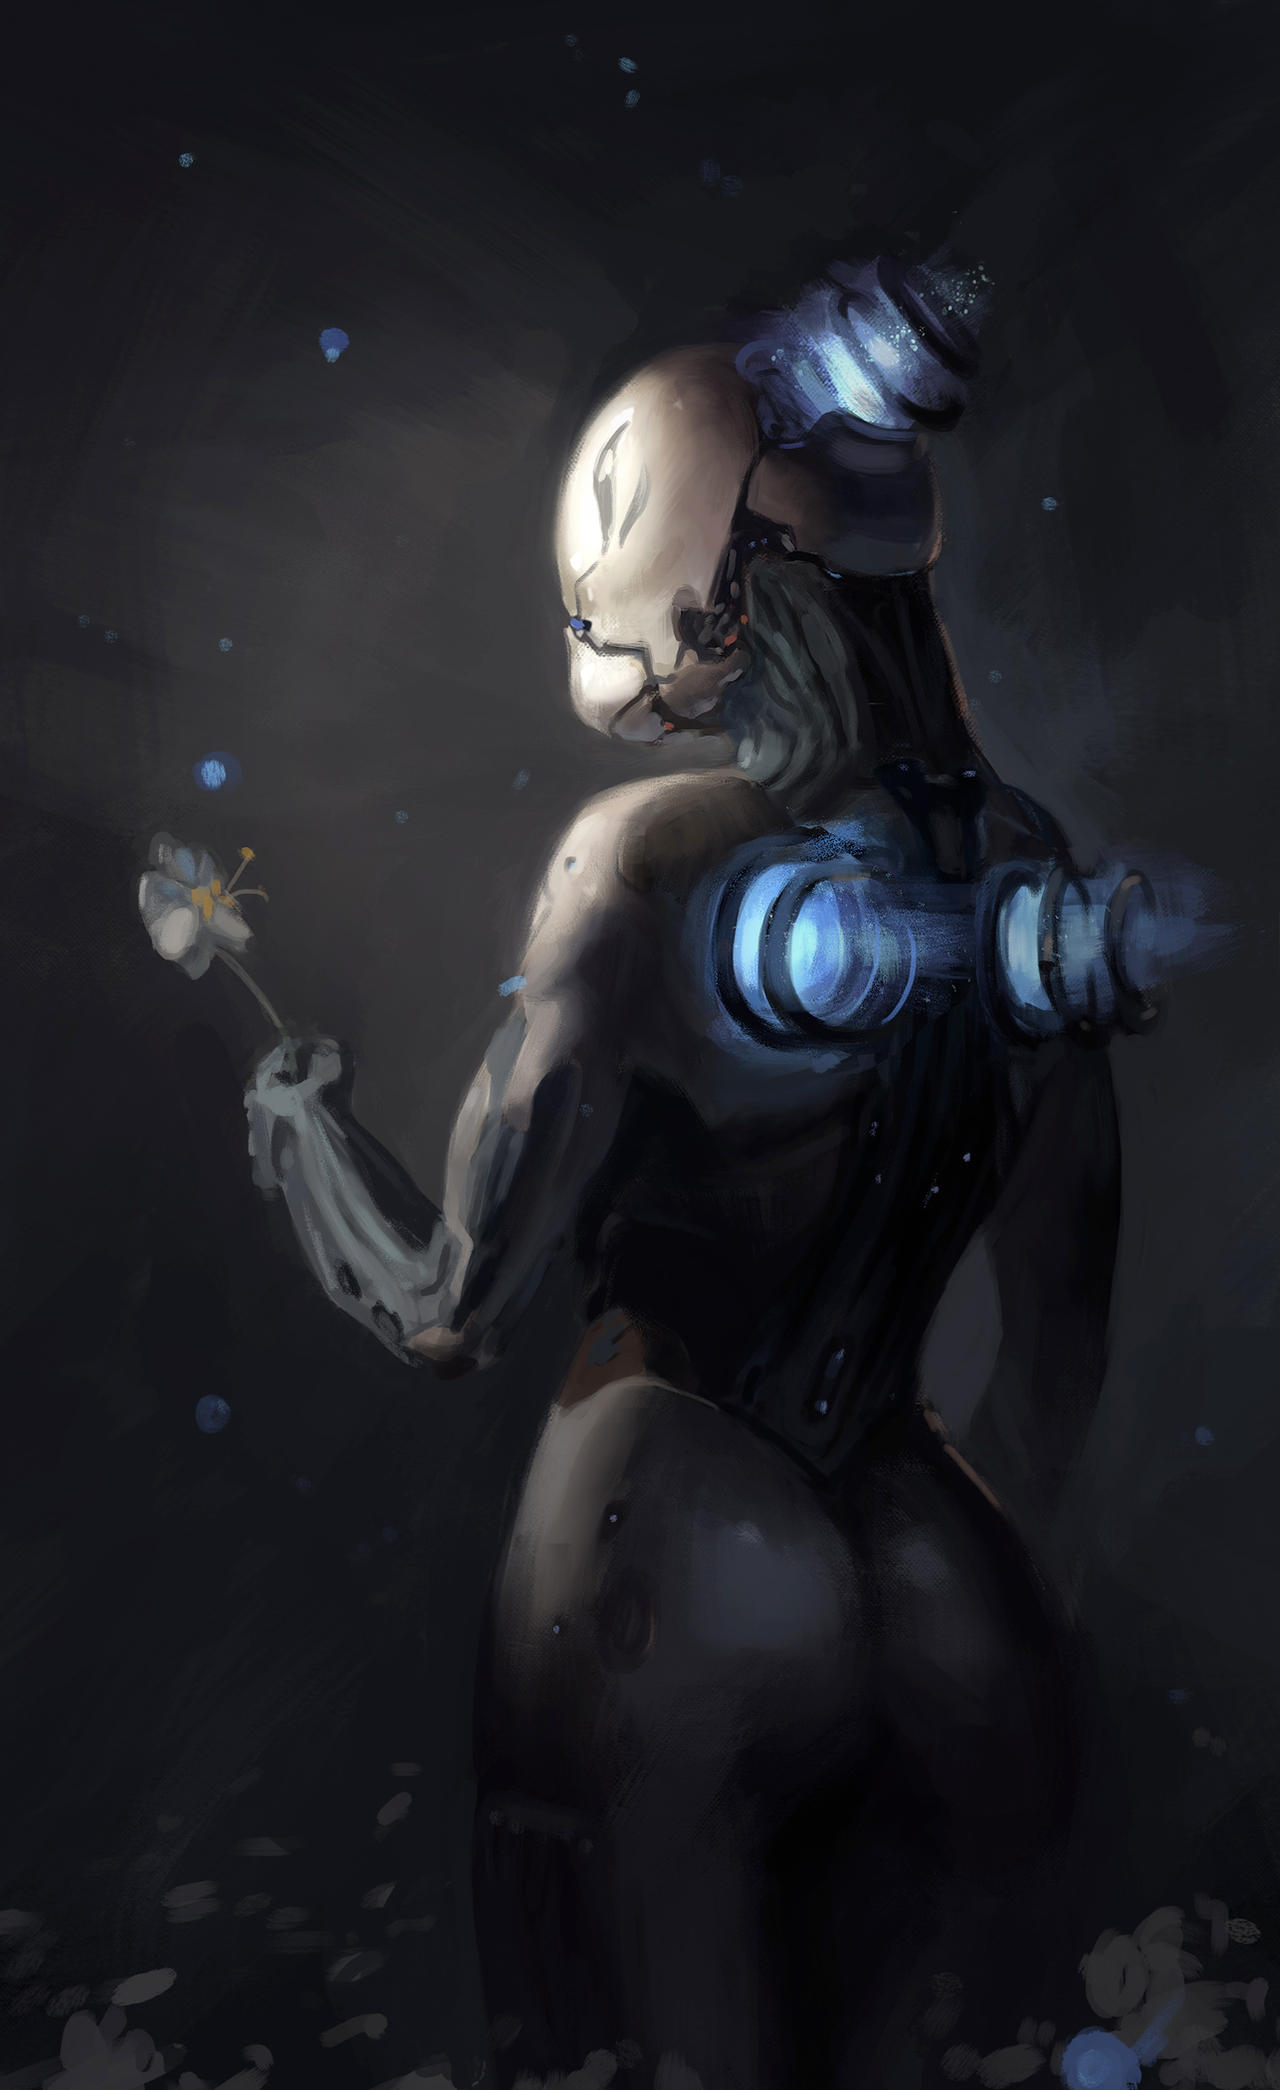 Dark Nova Figure Nova With Flower By Yukira Dj